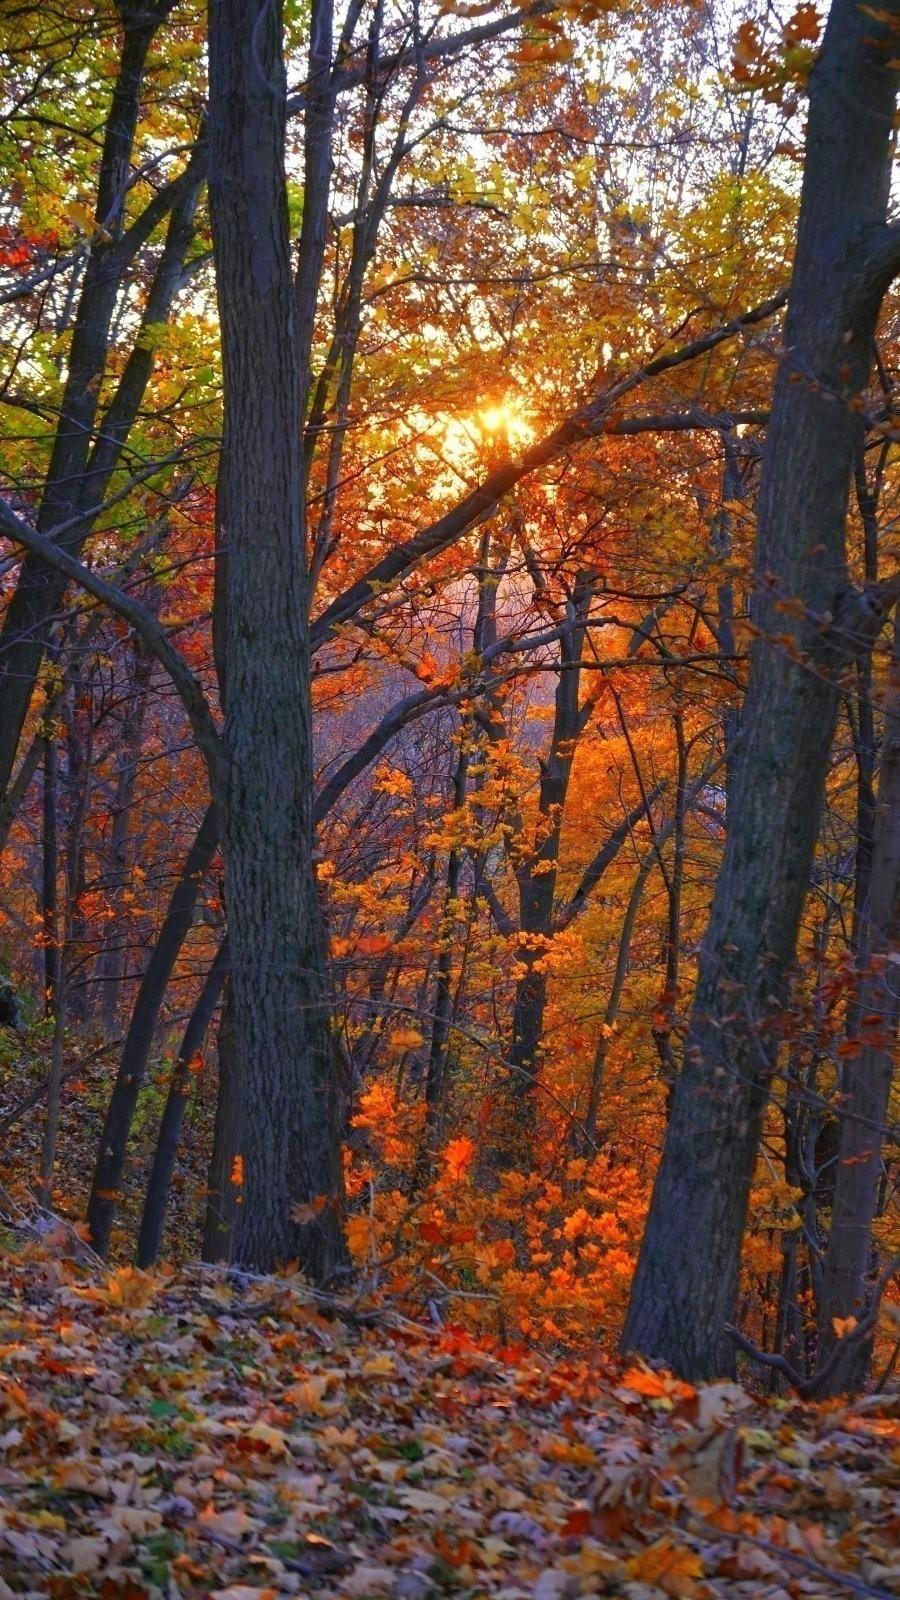 LX100 Oakwood luminous leaves sunset 031-002.JPG